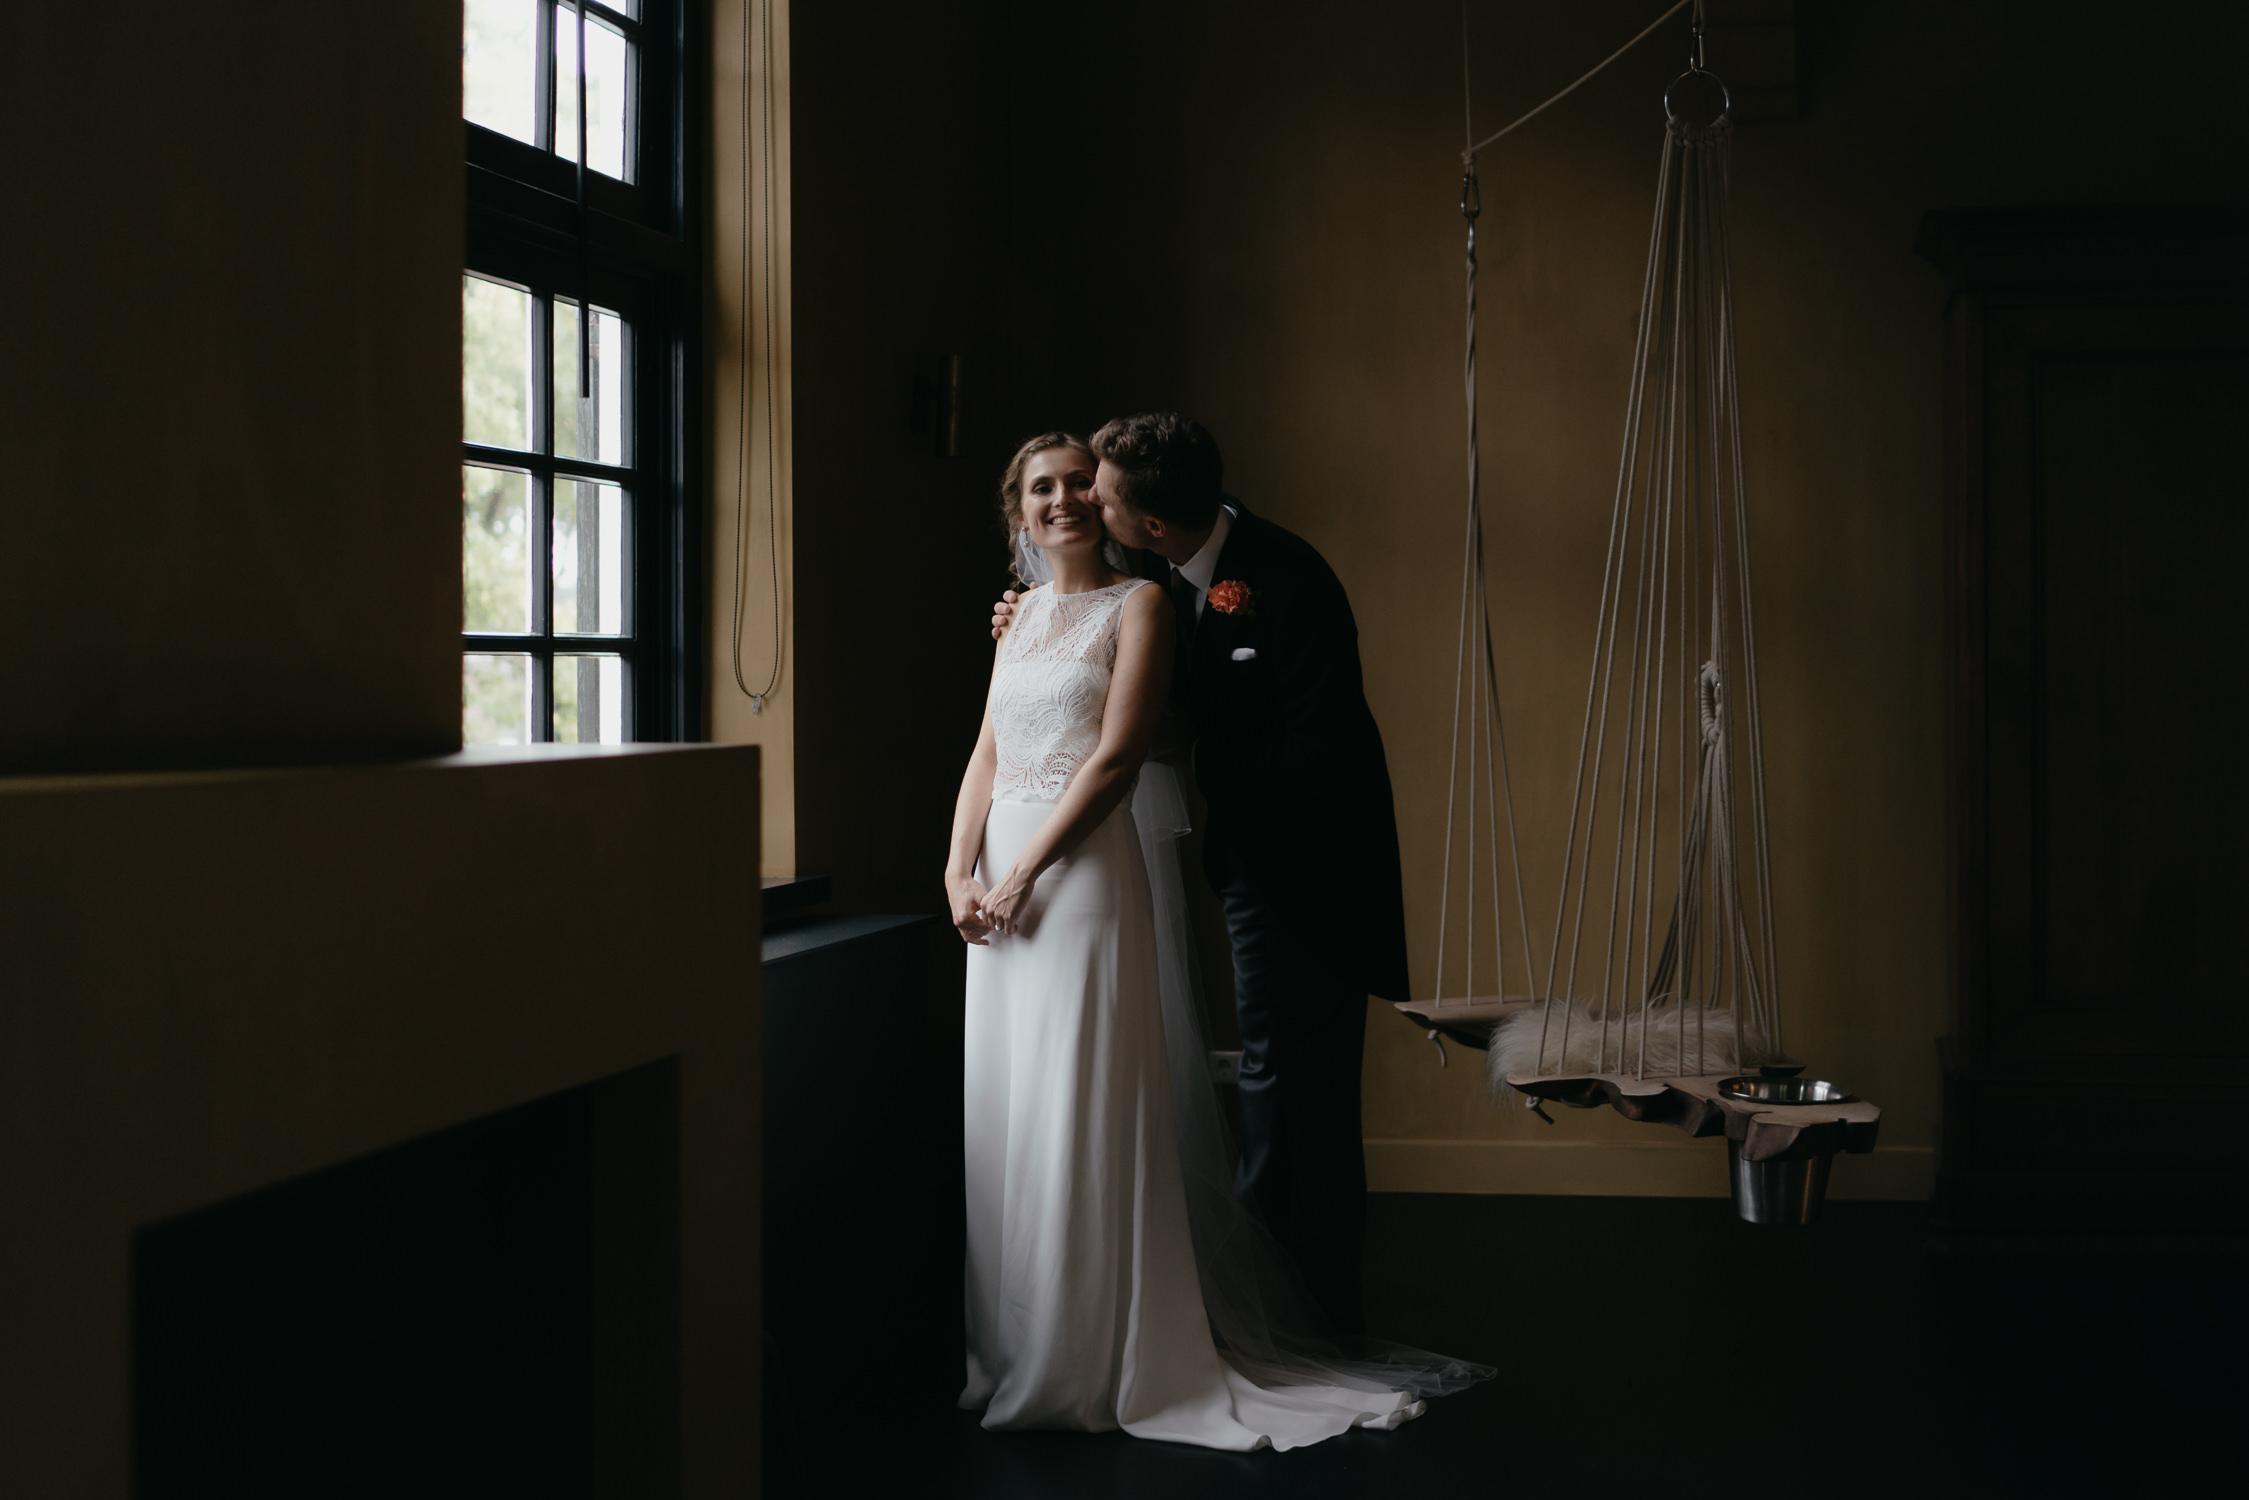 bridal portrait session photography amsterdam wedding photographer